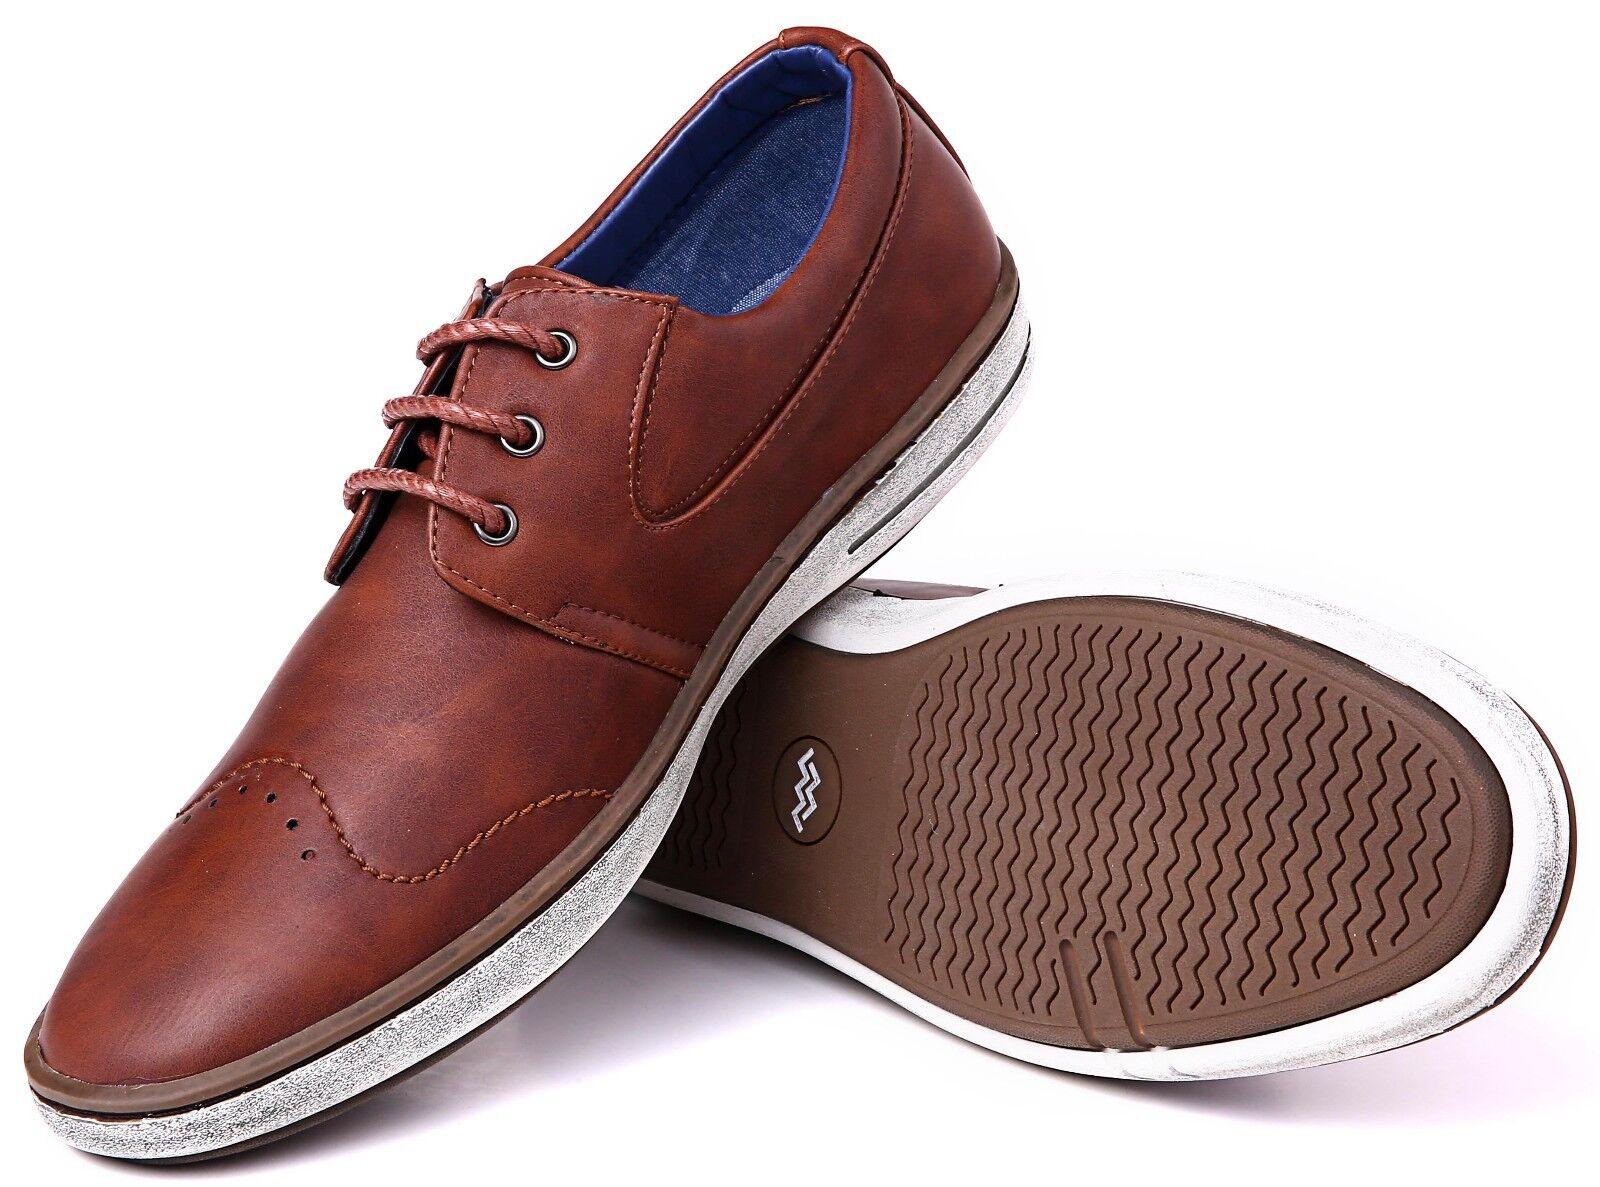 Mio Marino, Mens Dress Shoes - Fashion Casual Oxford Shoes f